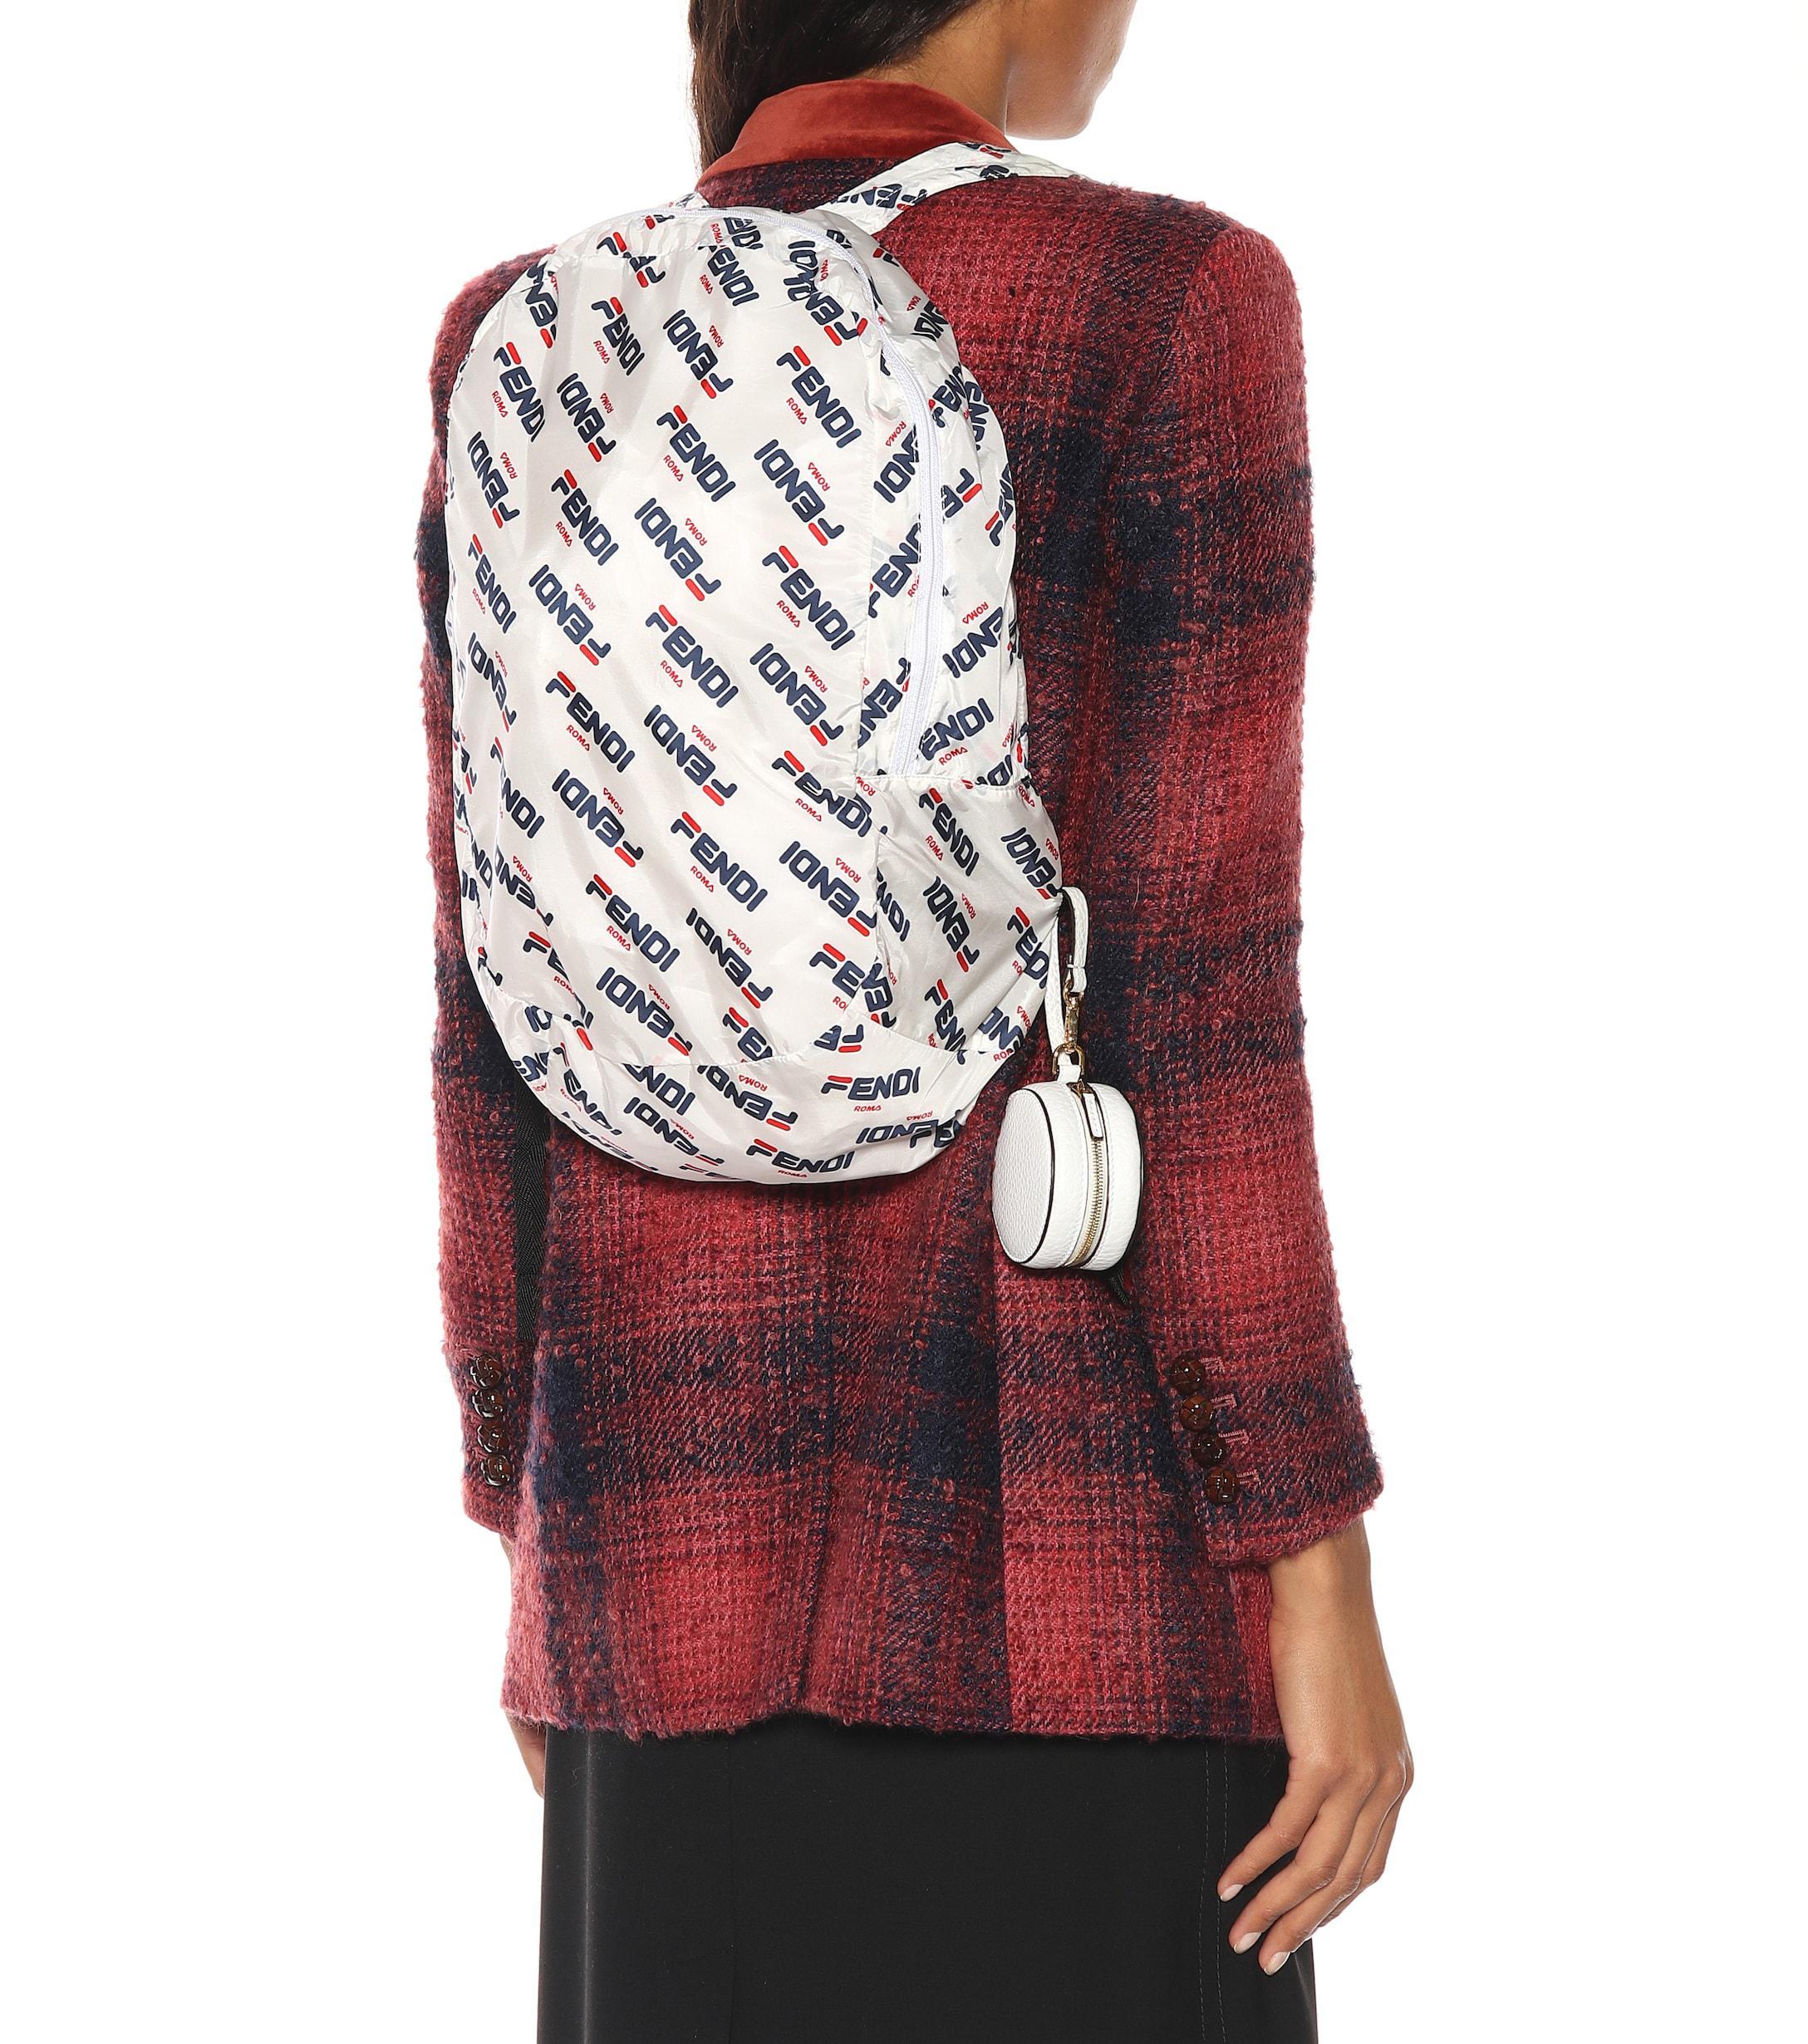 Fendi - Multicolor Mania Leather Backpack Charm - Lyst. View fullscreen d88d512c34fae